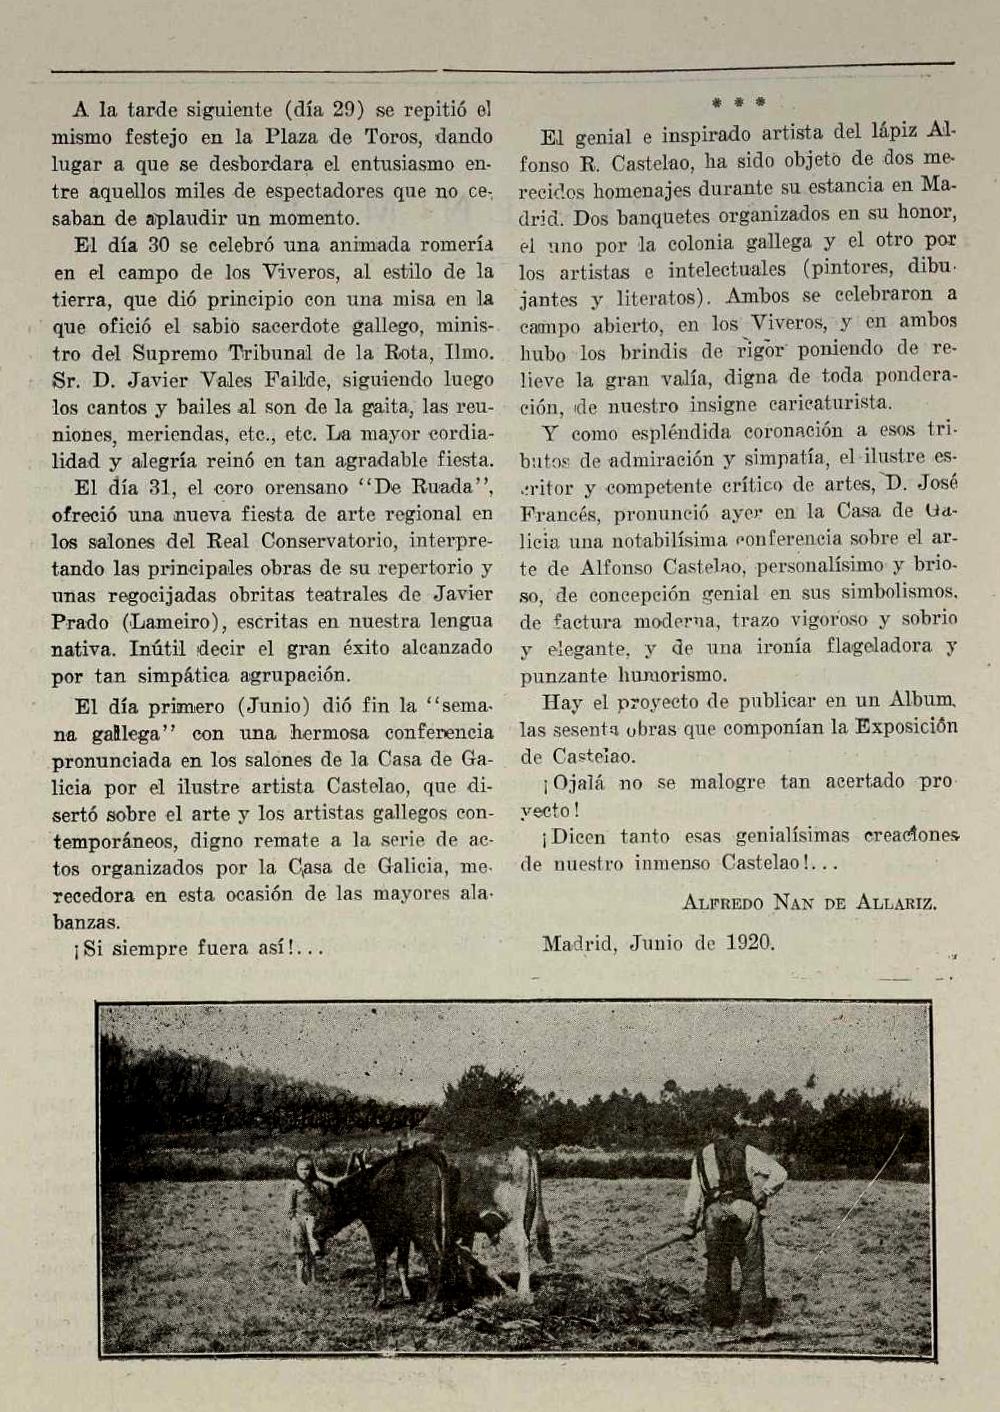 1920.06Galicia.revista semanal ilustrada2